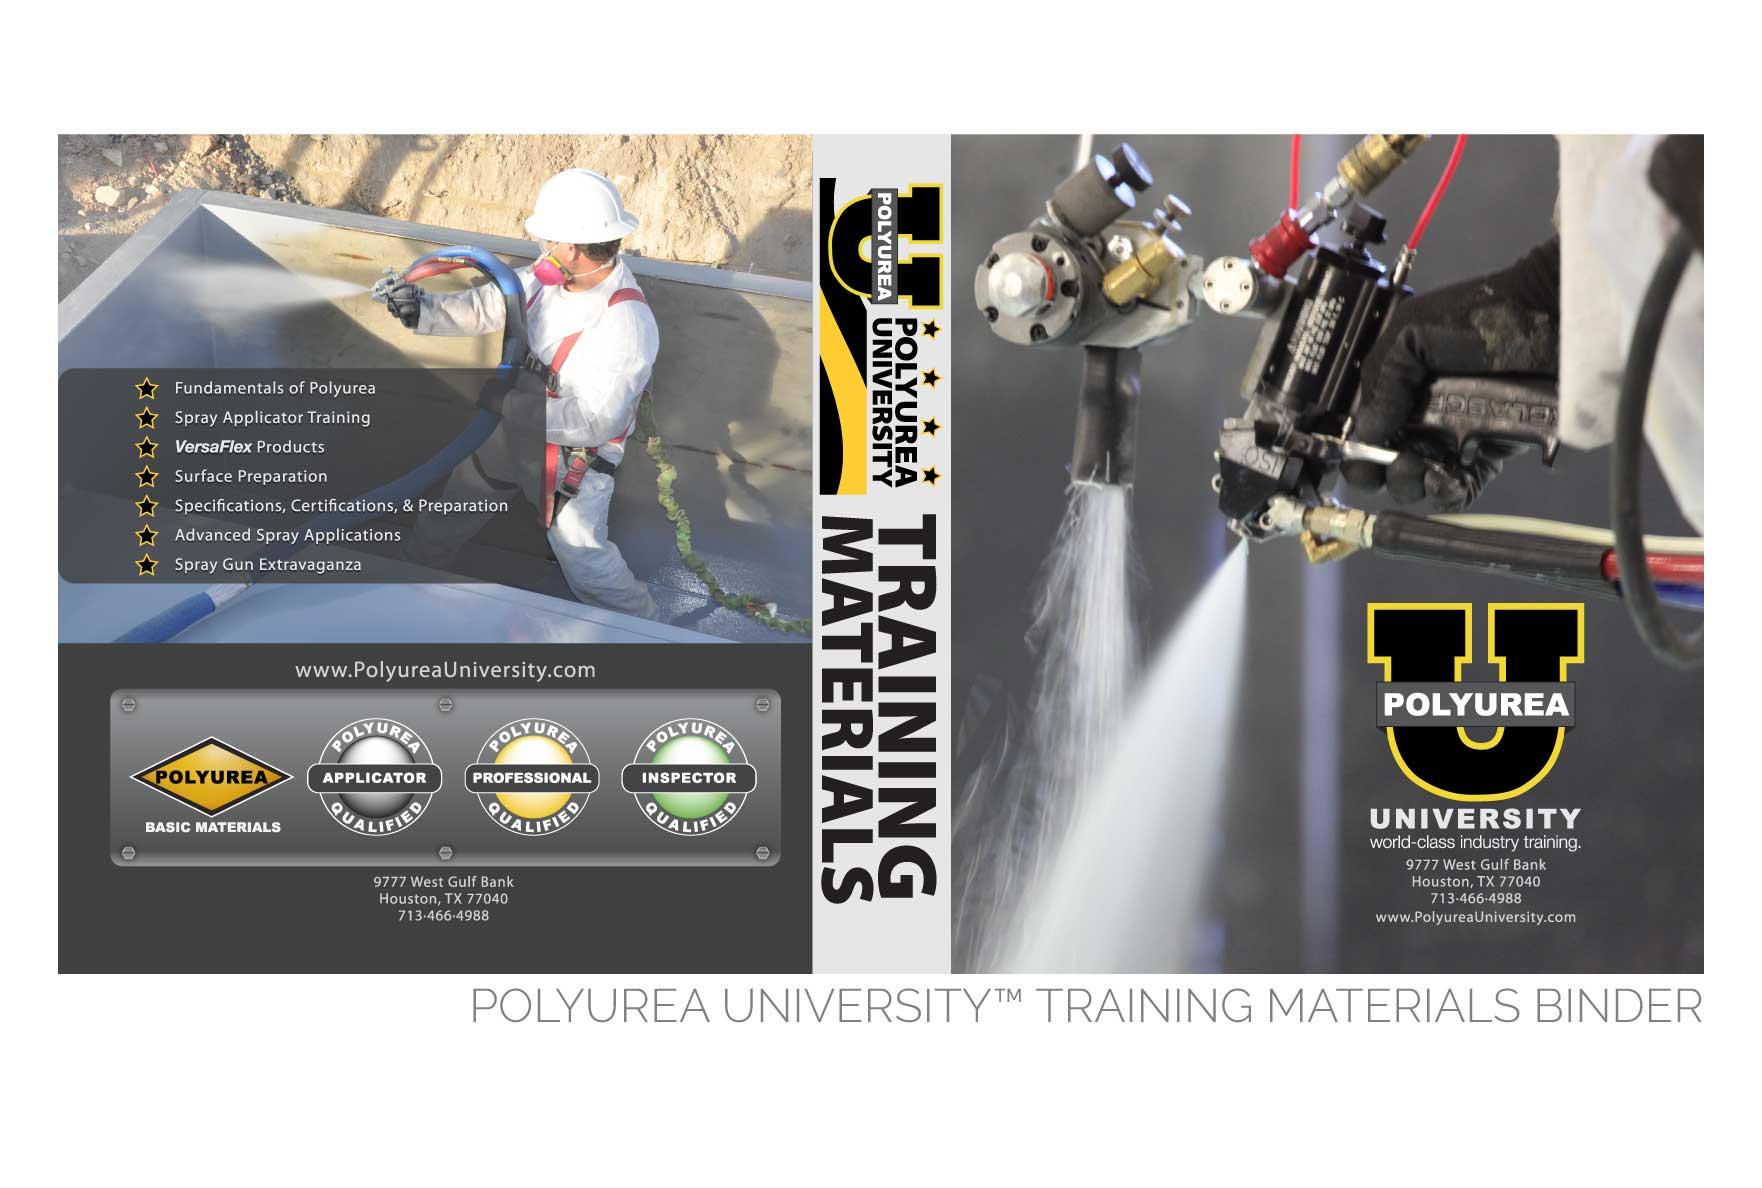 Branding & Marketing: Polyurea University – PNR Collective